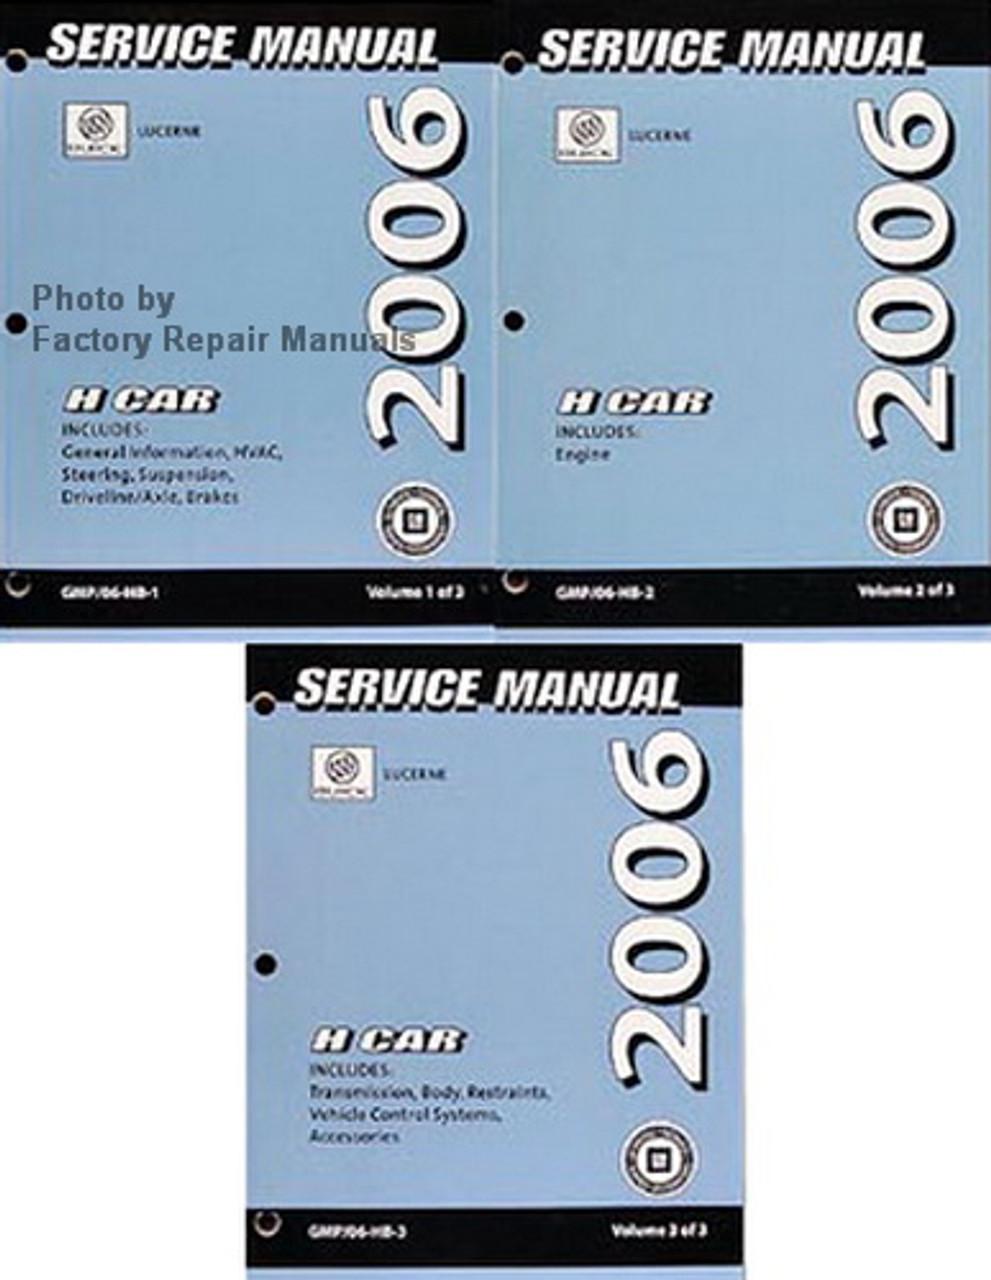 2006 Buick Lucerne Factory Shop Service Repair Manual 3 Volume Set